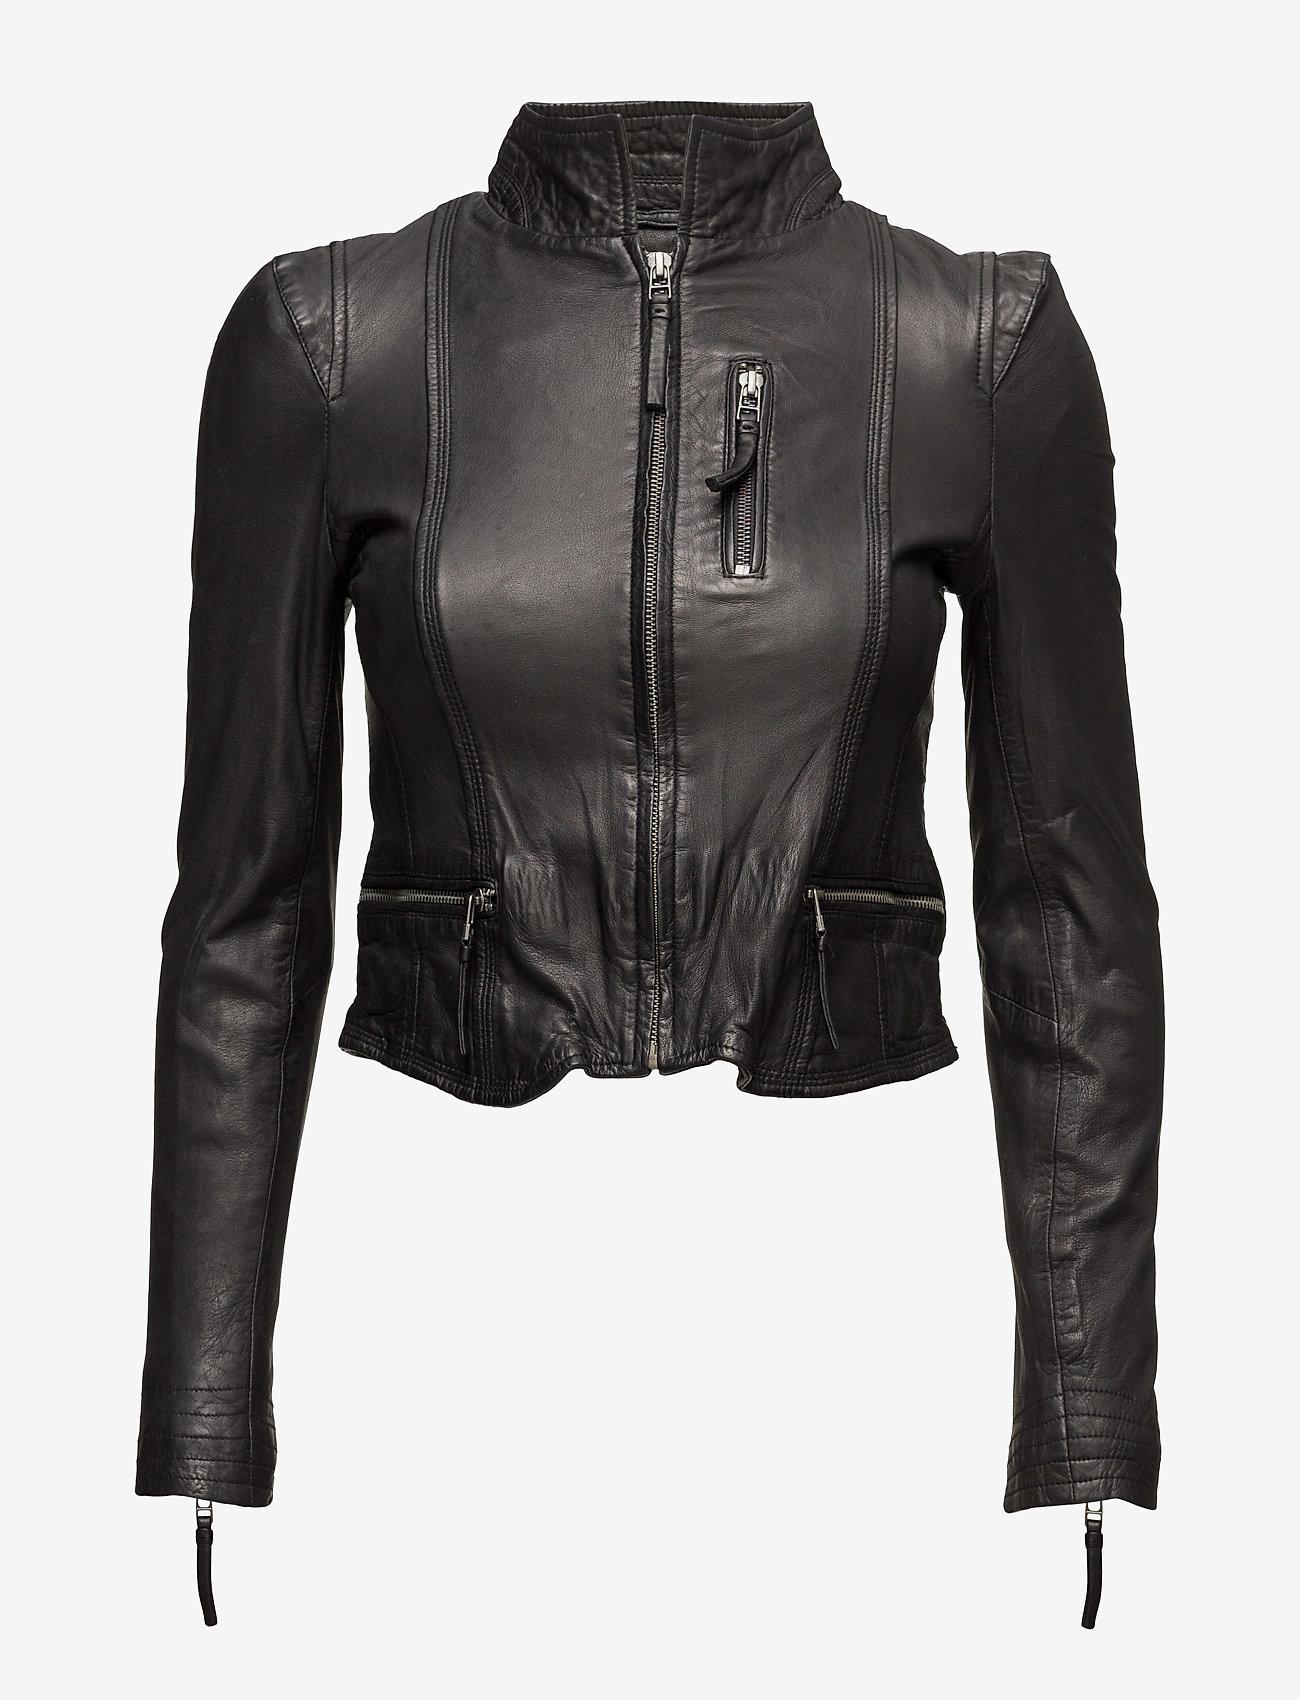 MDK / Munderingskompagniet - Rucy Leather Jacket - black - 0